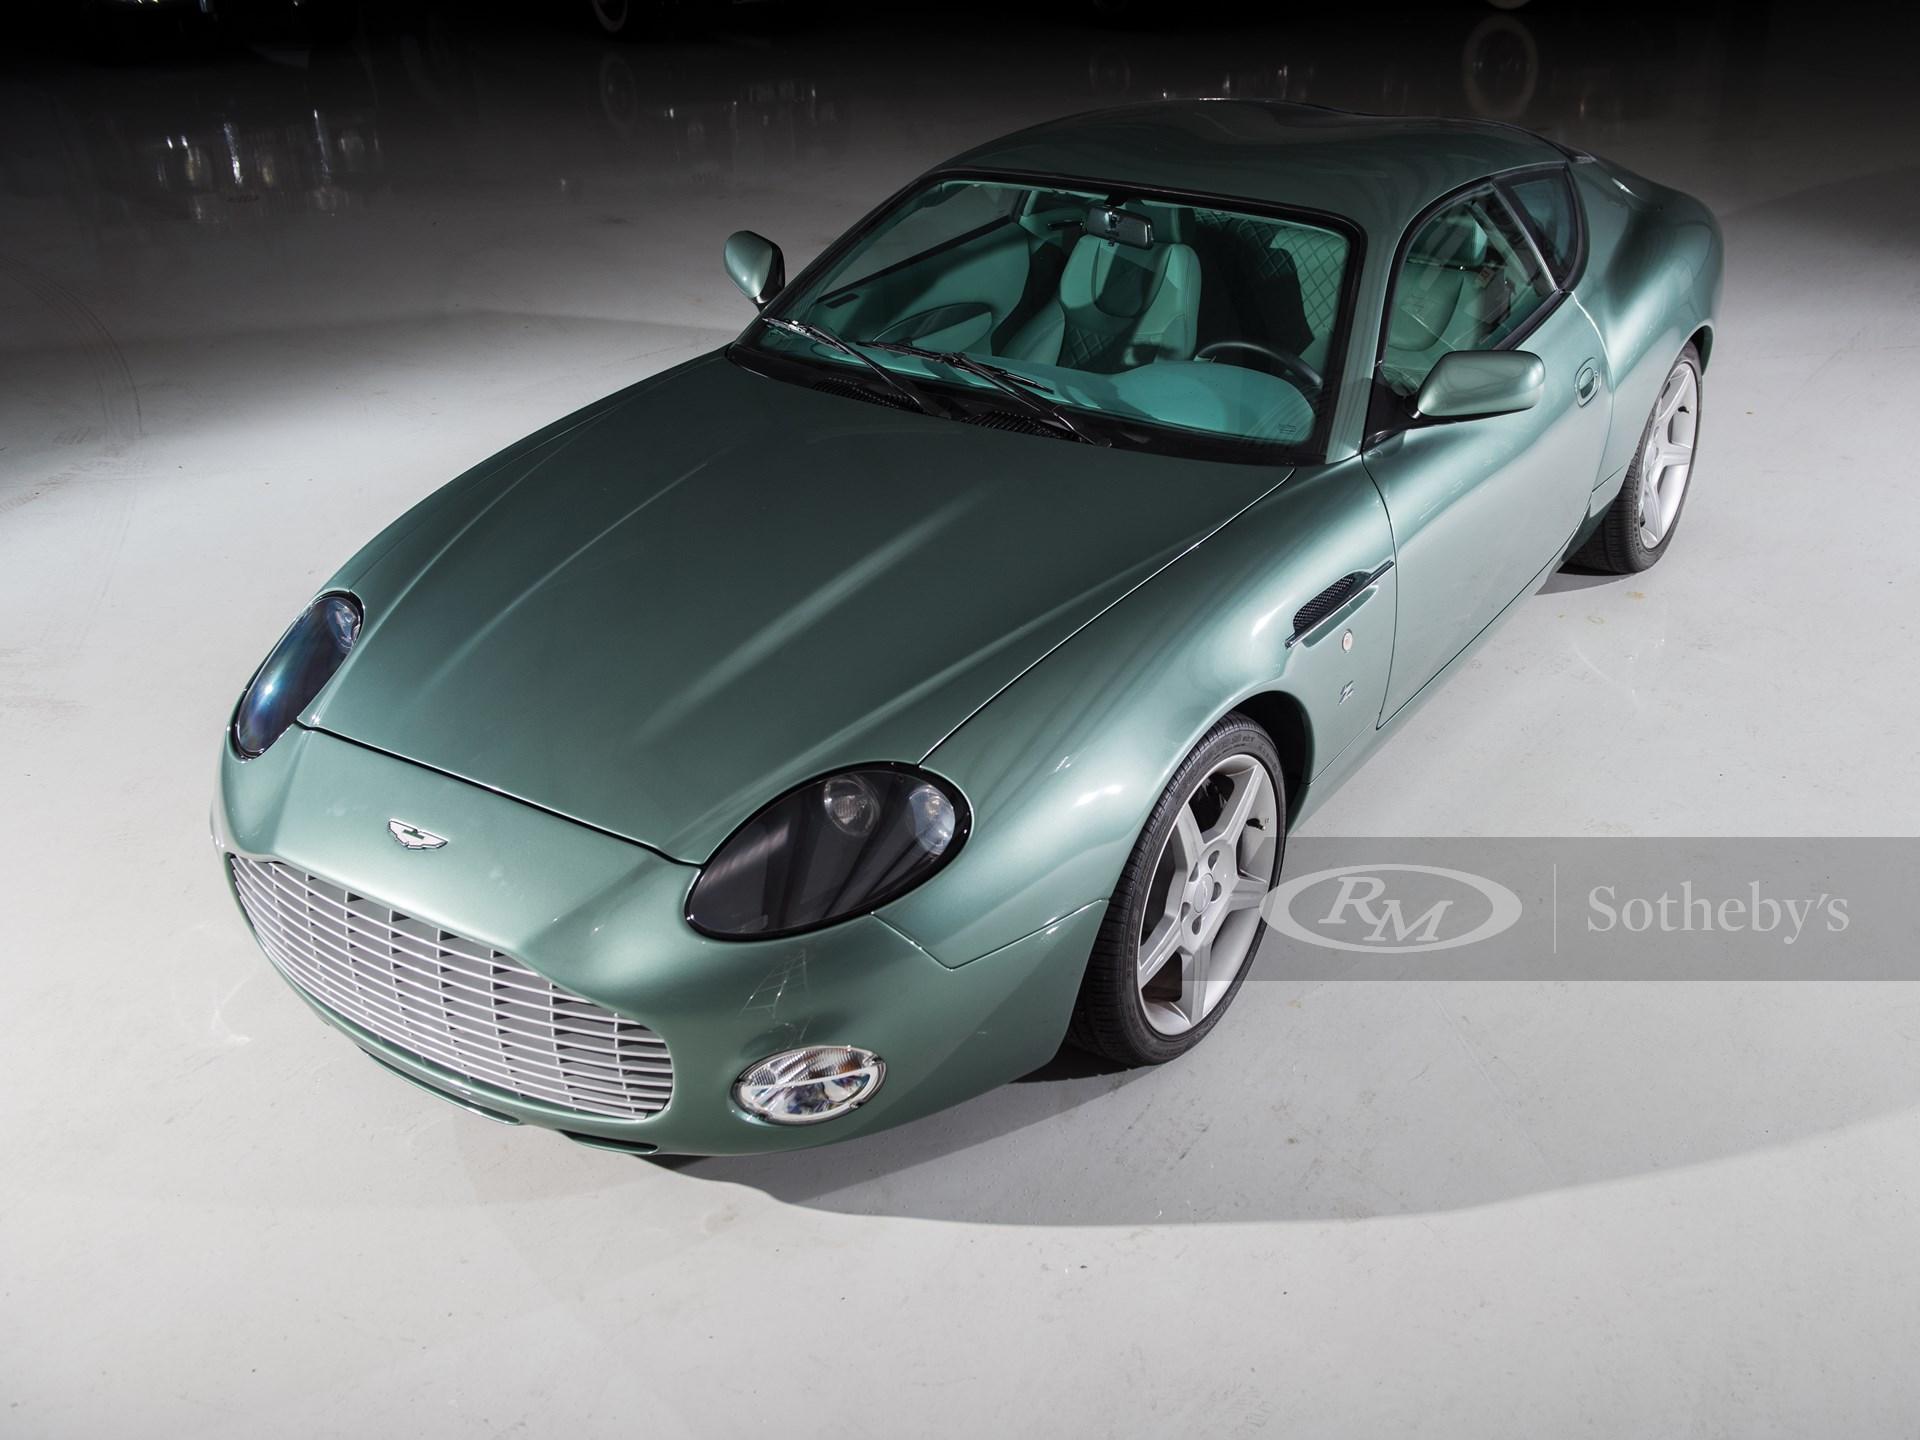 2003 Aston Martin Db7 Zagato Amelia Island 2017 Rm Sotheby S